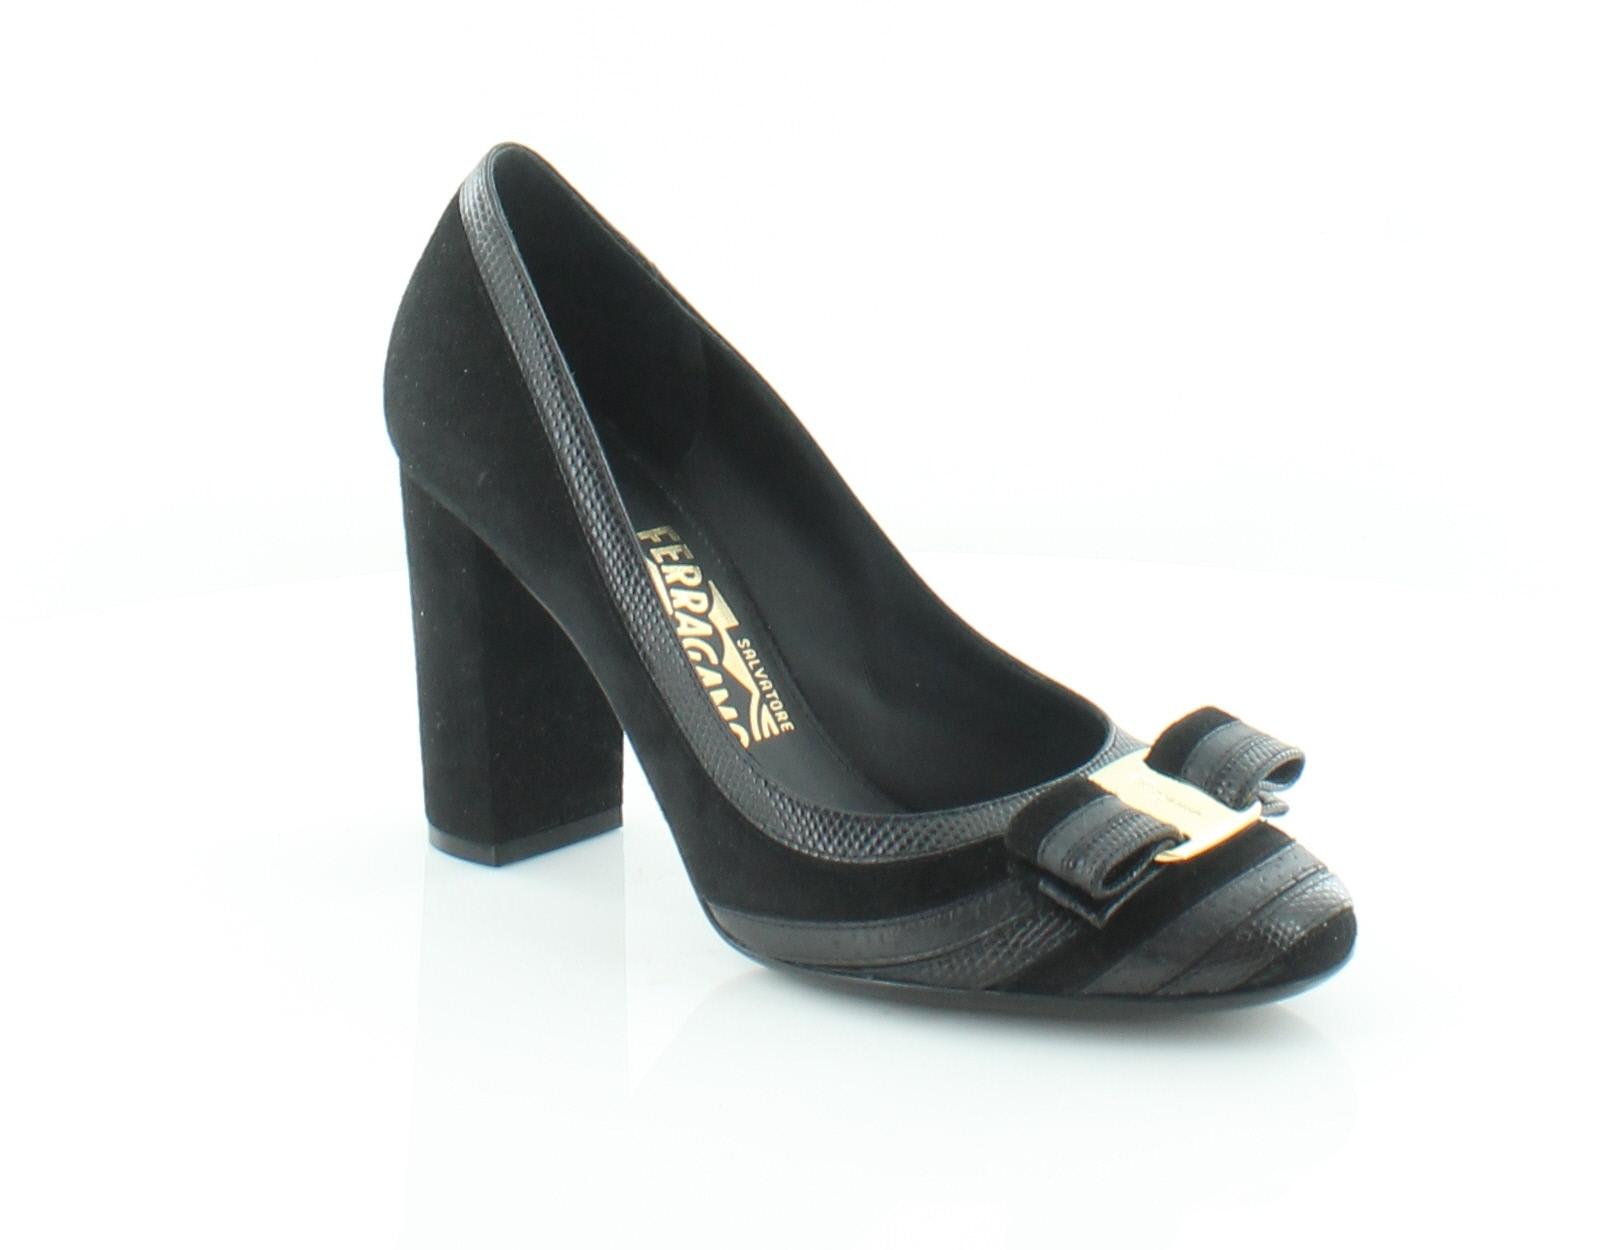 63429f3fd74f Salvatore Ferragamo Fosca Black Womens Shoes Size 7 M Heels MSRP  795